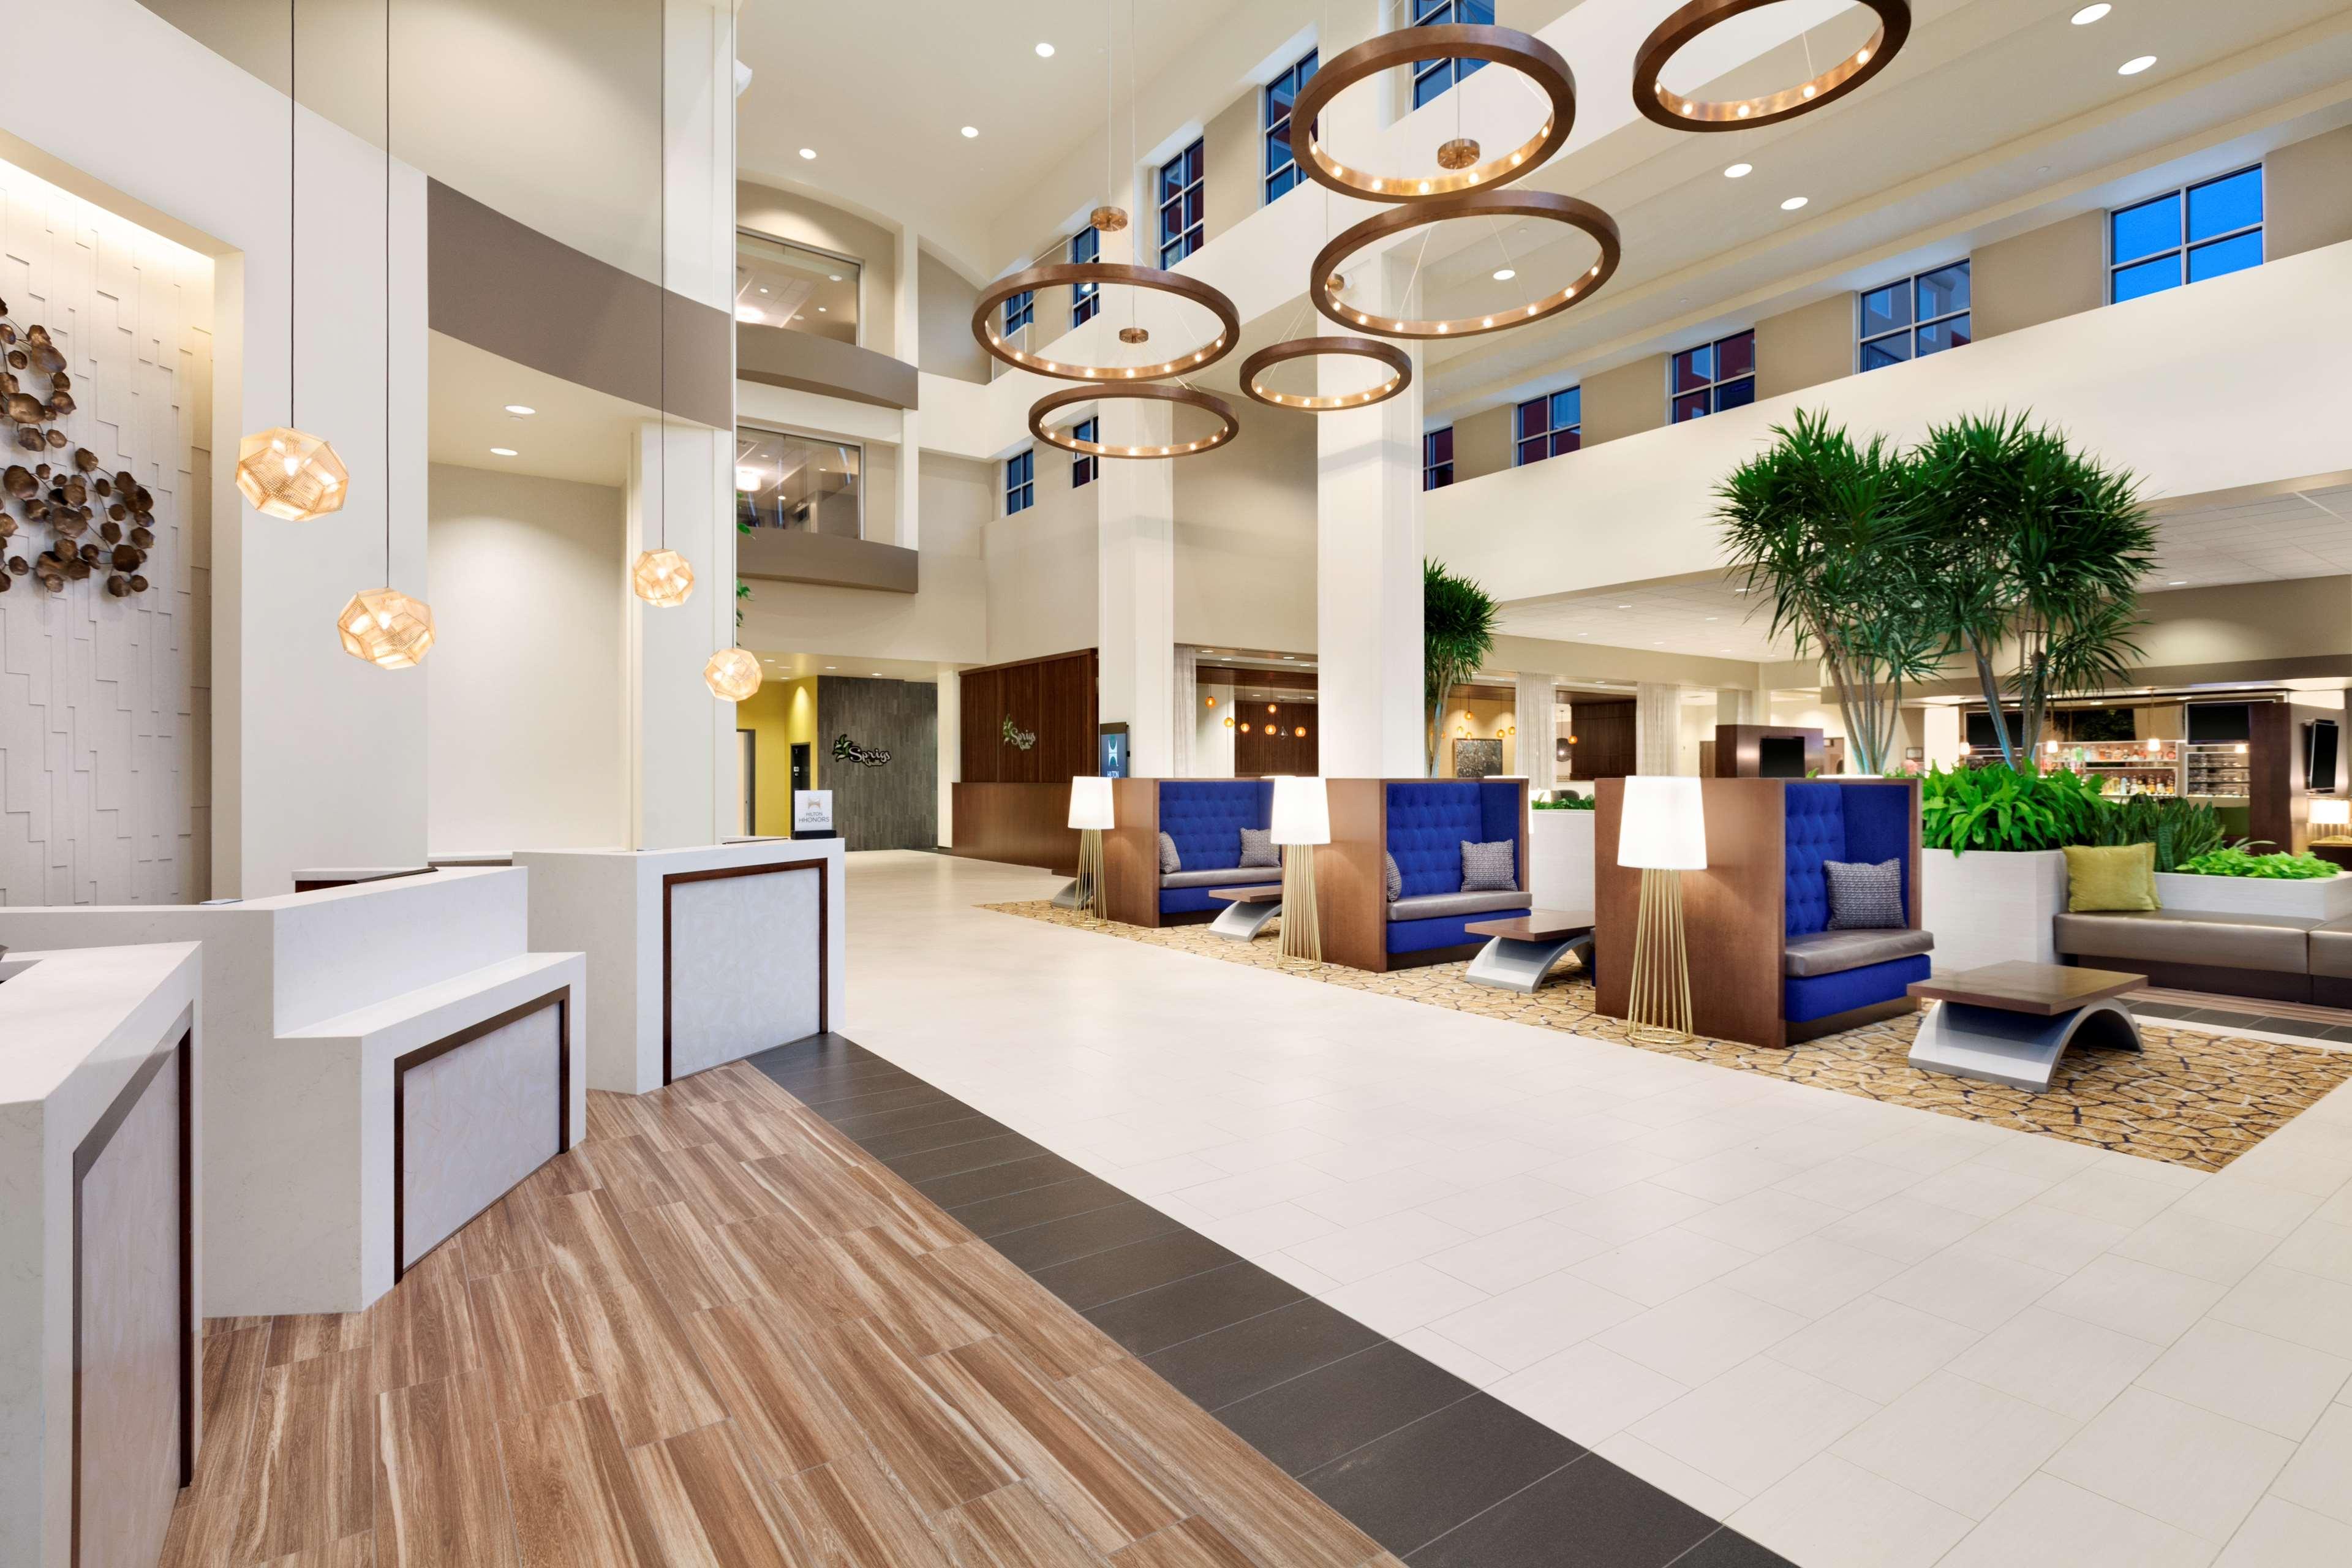 Embassy Suites by Hilton Portland Hillsboro, Oregon image 4